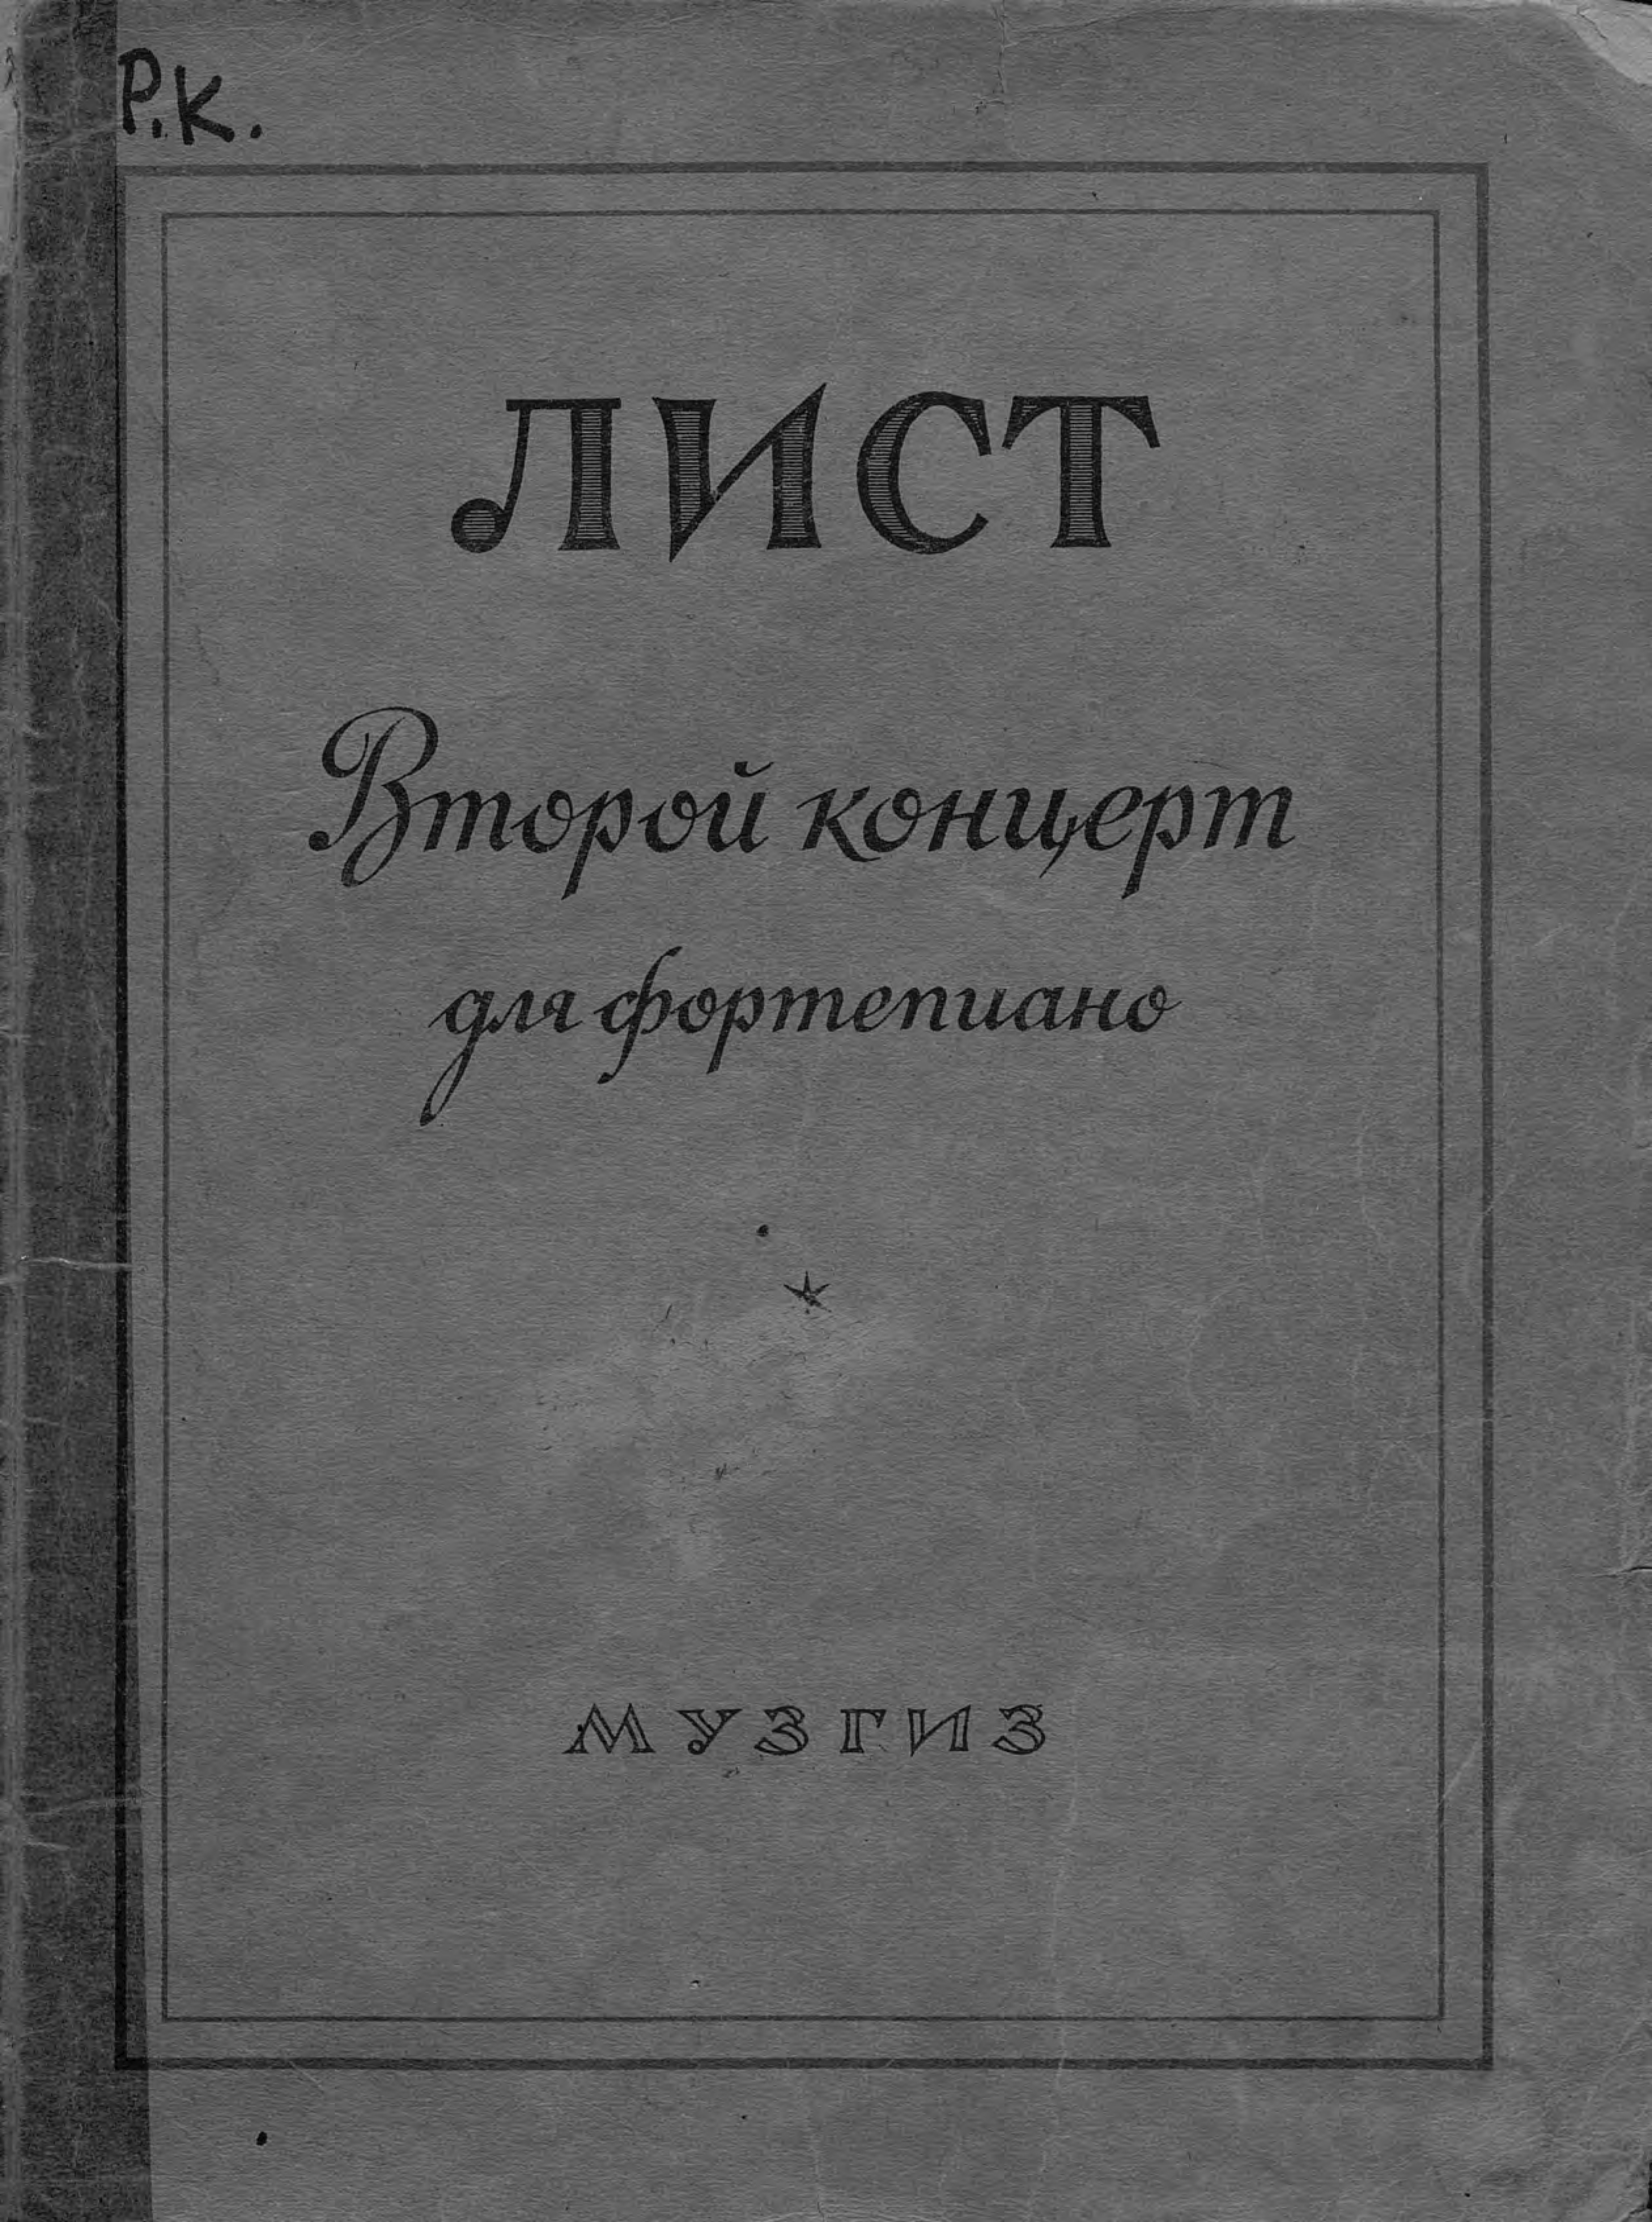 Ференц Лист Второй концерт для фортепиано с оркестром ференц лист думка